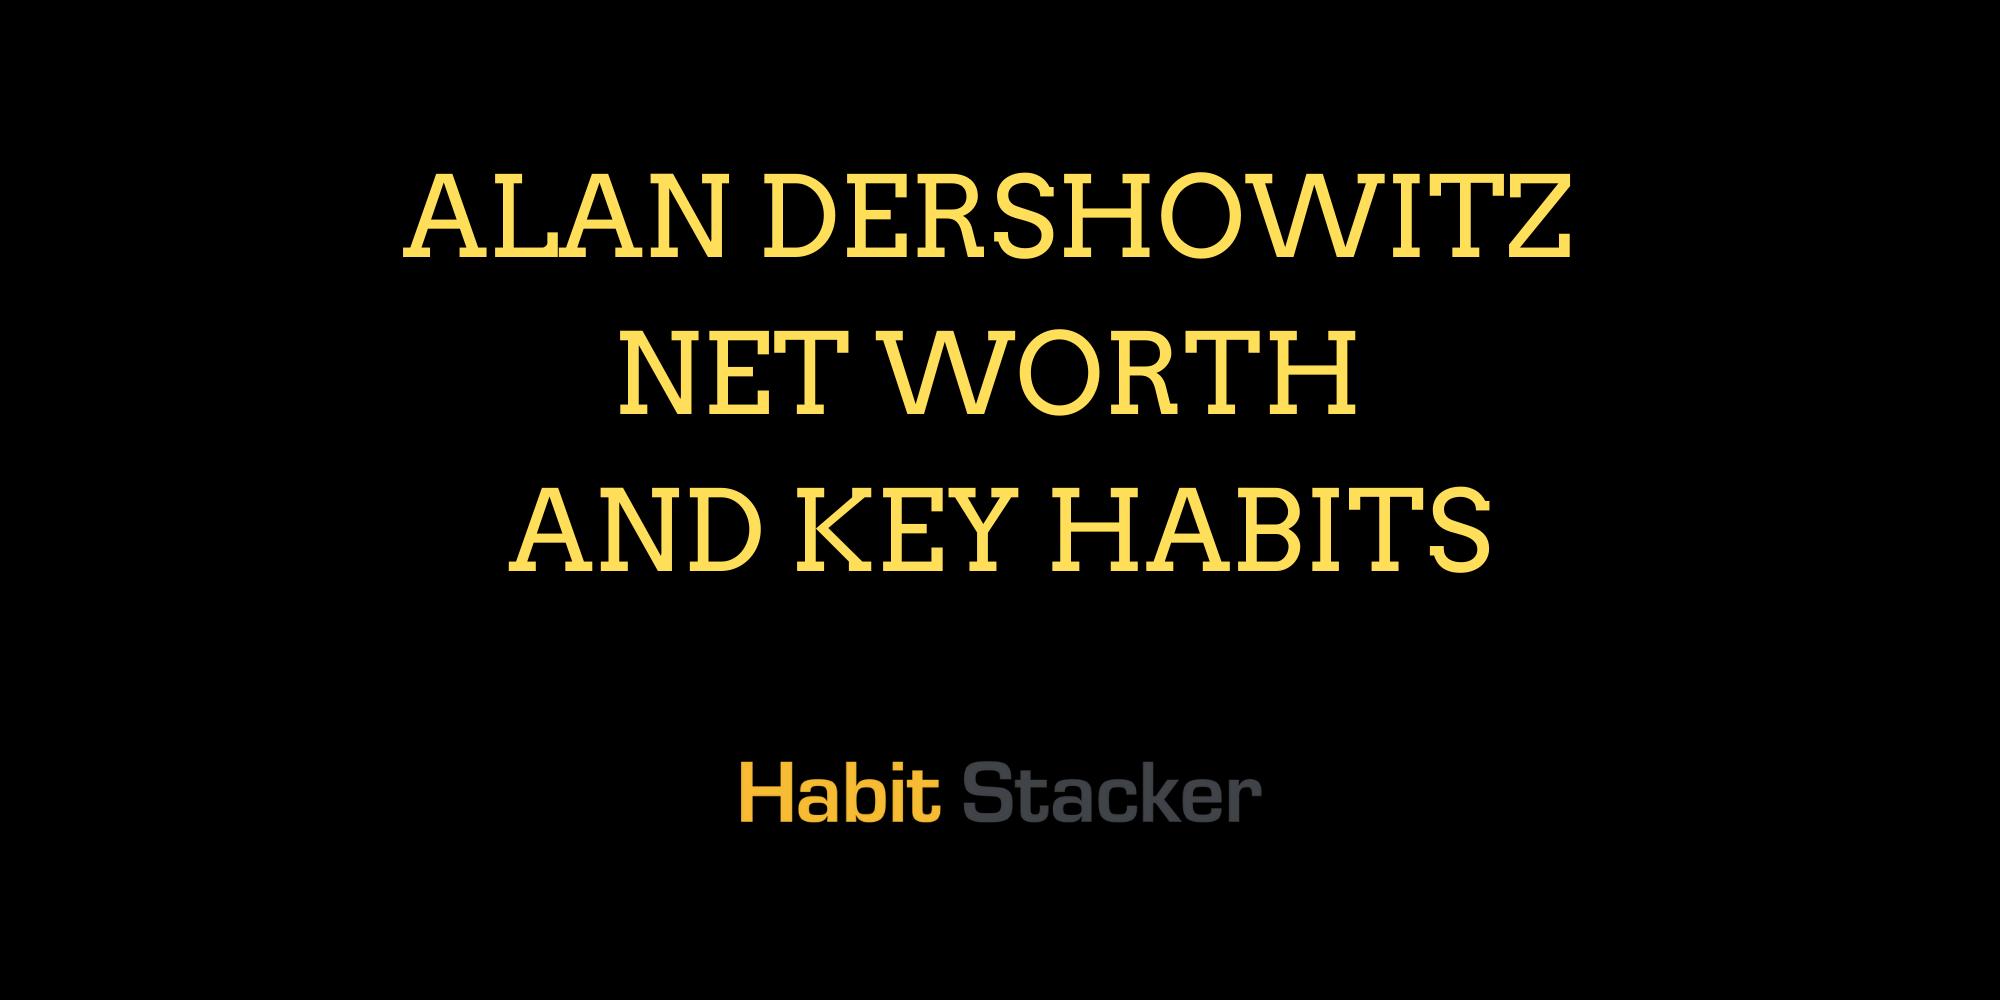 Alan Dershowitz Net Worth and Key Habits